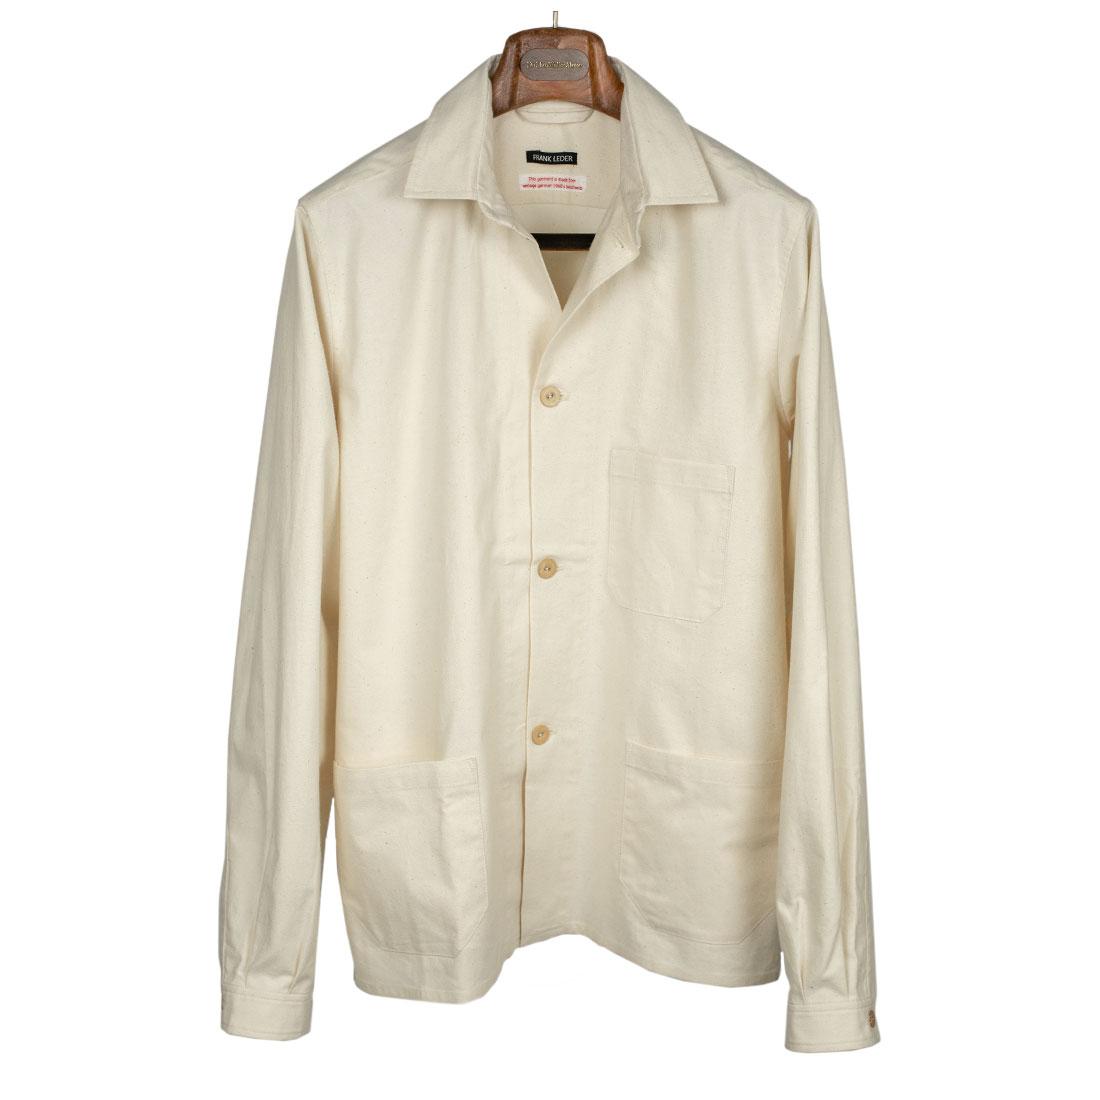 Frank Leder Spring Summer 2021 SS21 Made in Germany deadstock bedlinen shirt jacket (8).jpg